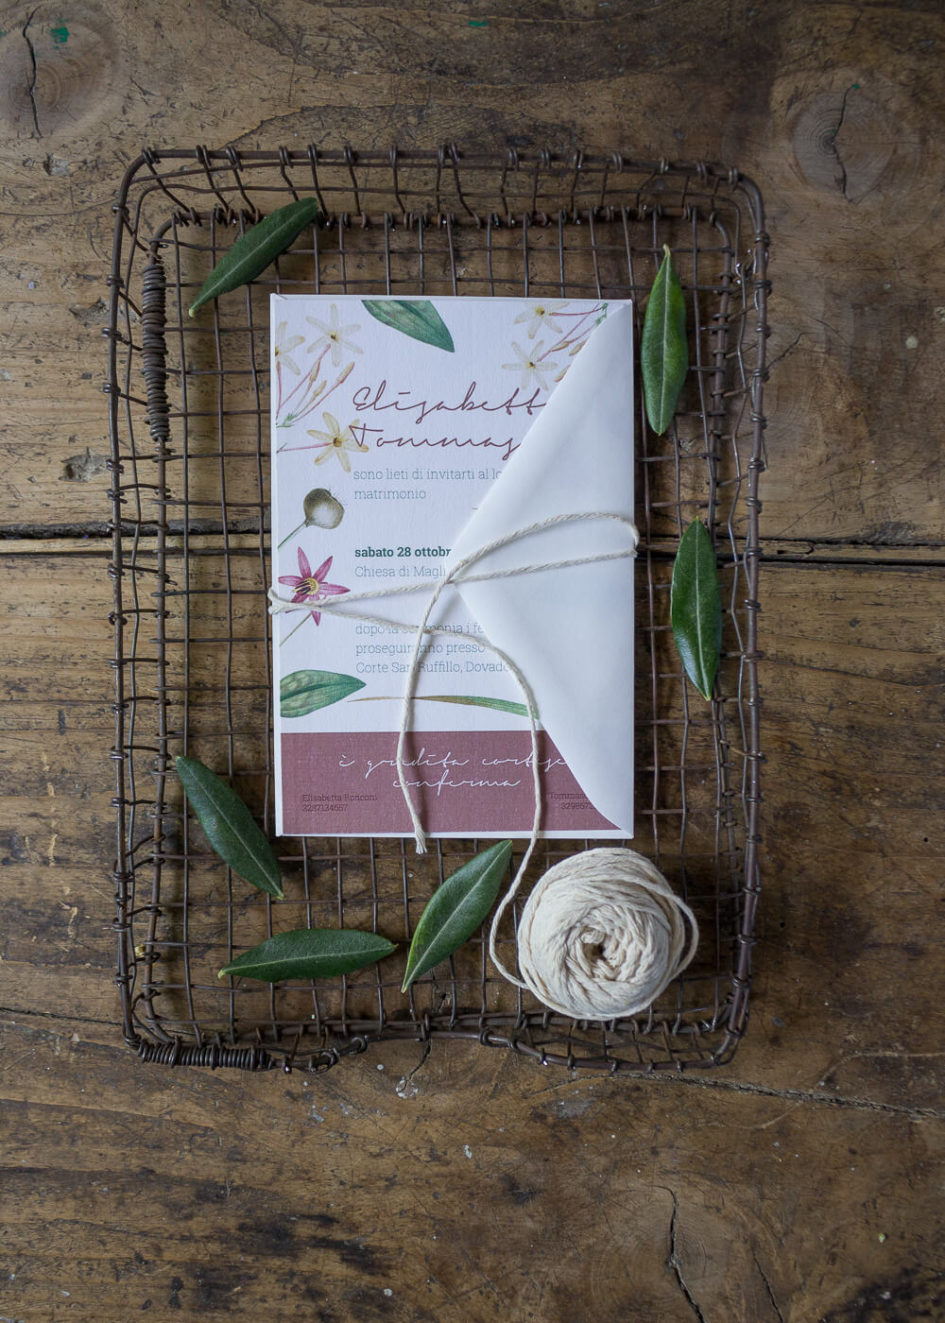 Wedding suite botanica Lillie - Partecipazioni di matrimonio botaniche in carta vergata - Lily&Sage Design